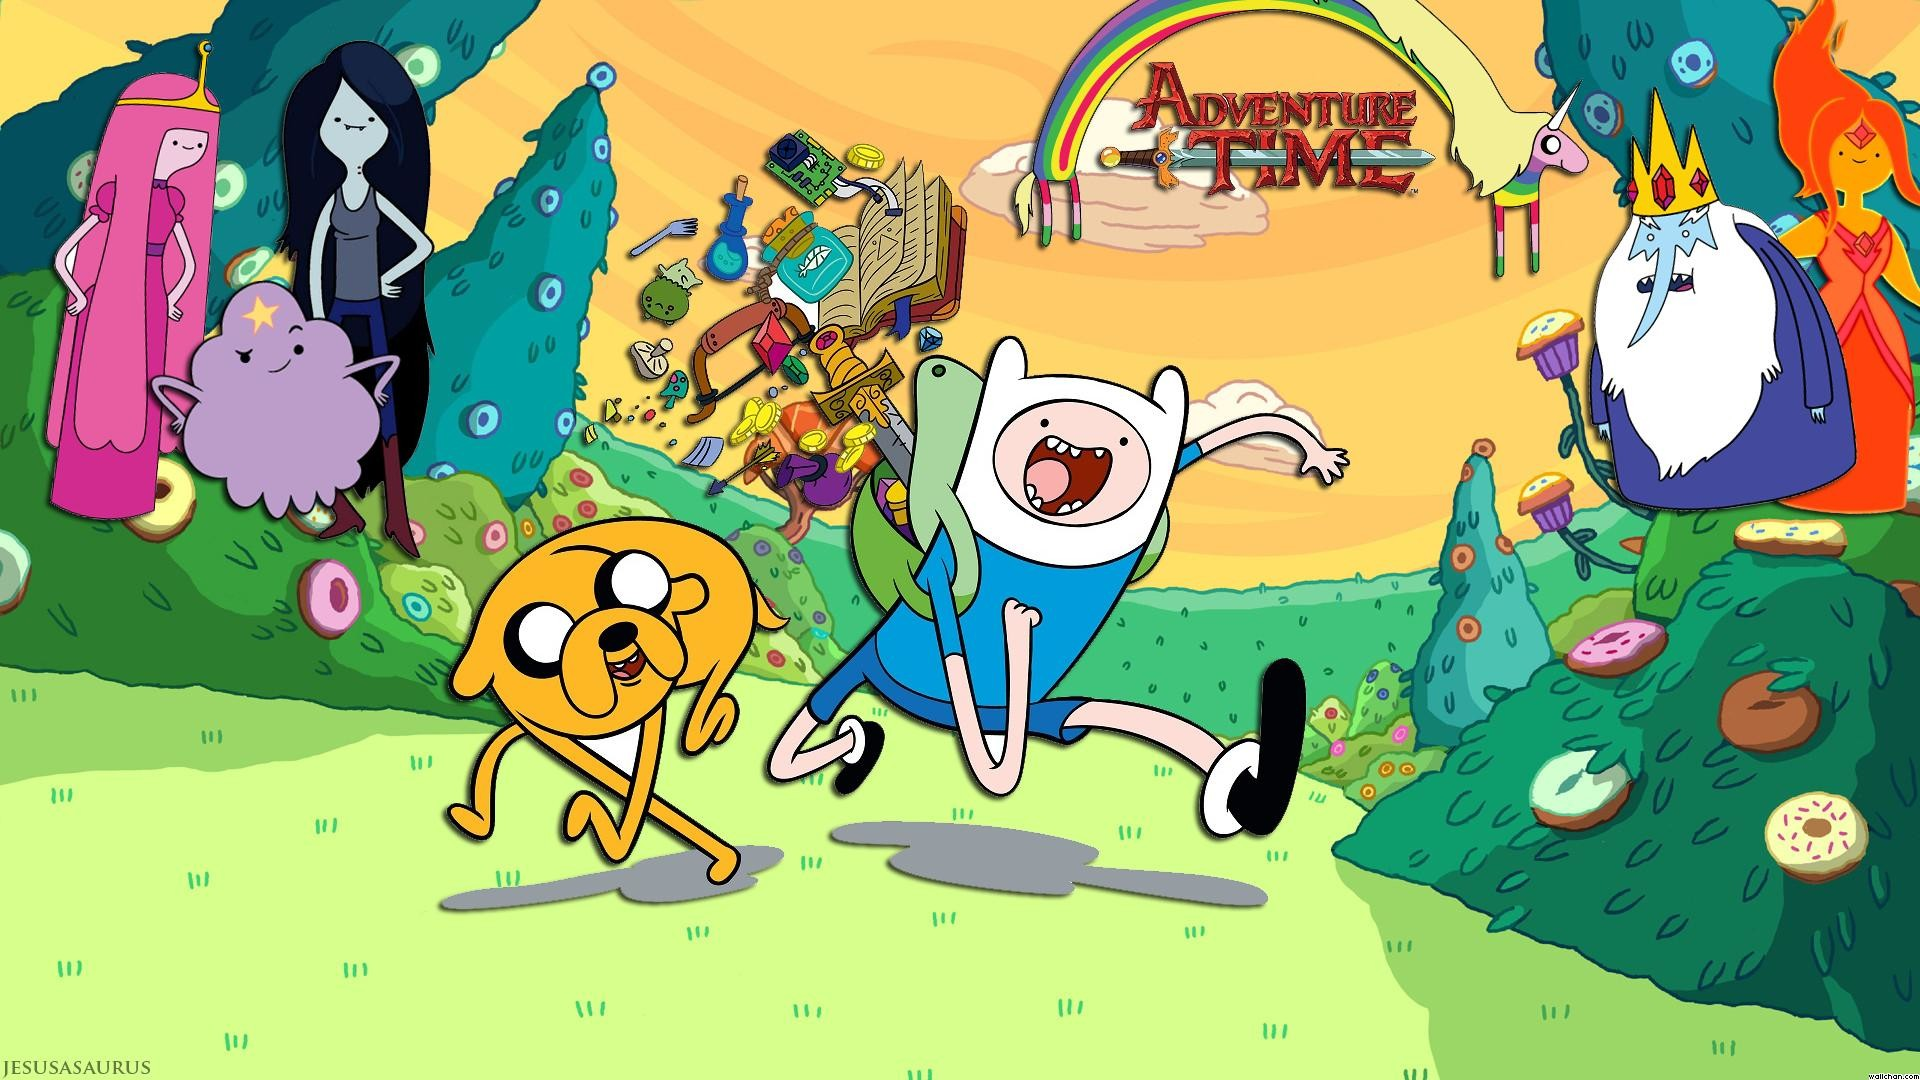 Adventure Time Miniseries